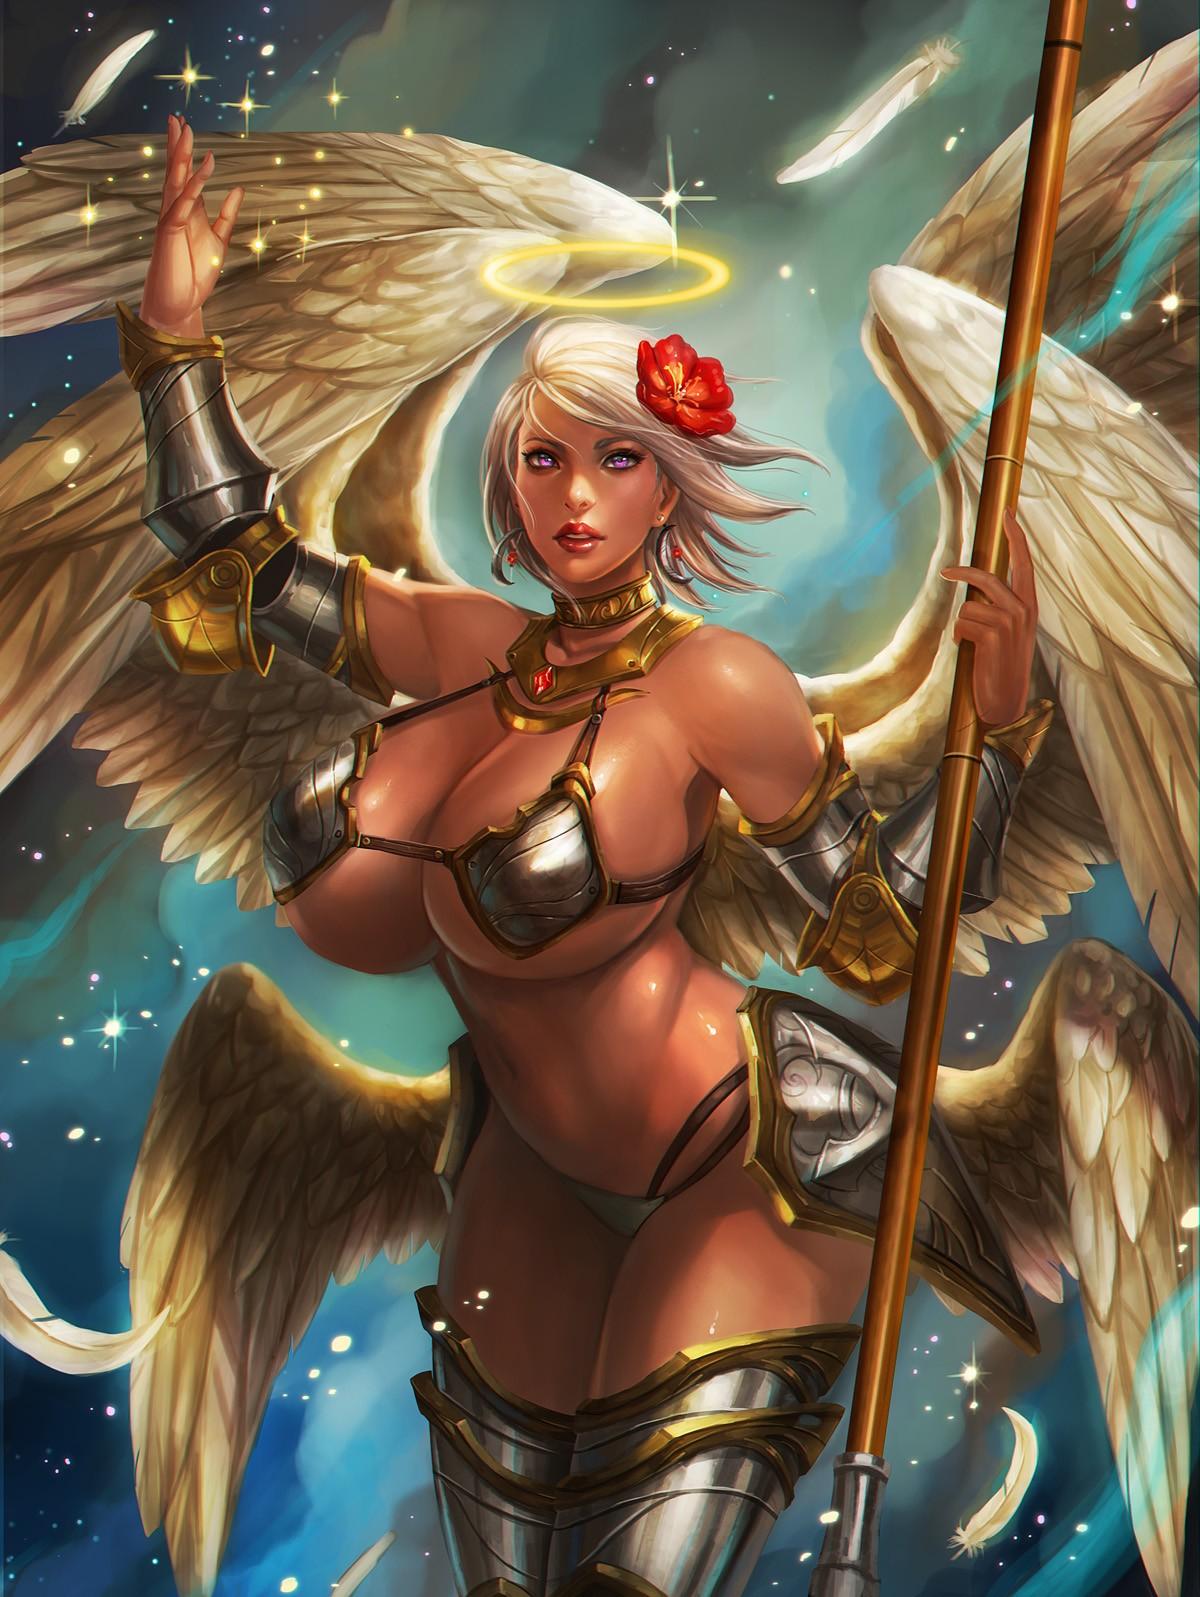 Wallpaper  Illustration, Anime, Wings, Angel, Big Boobs -6538